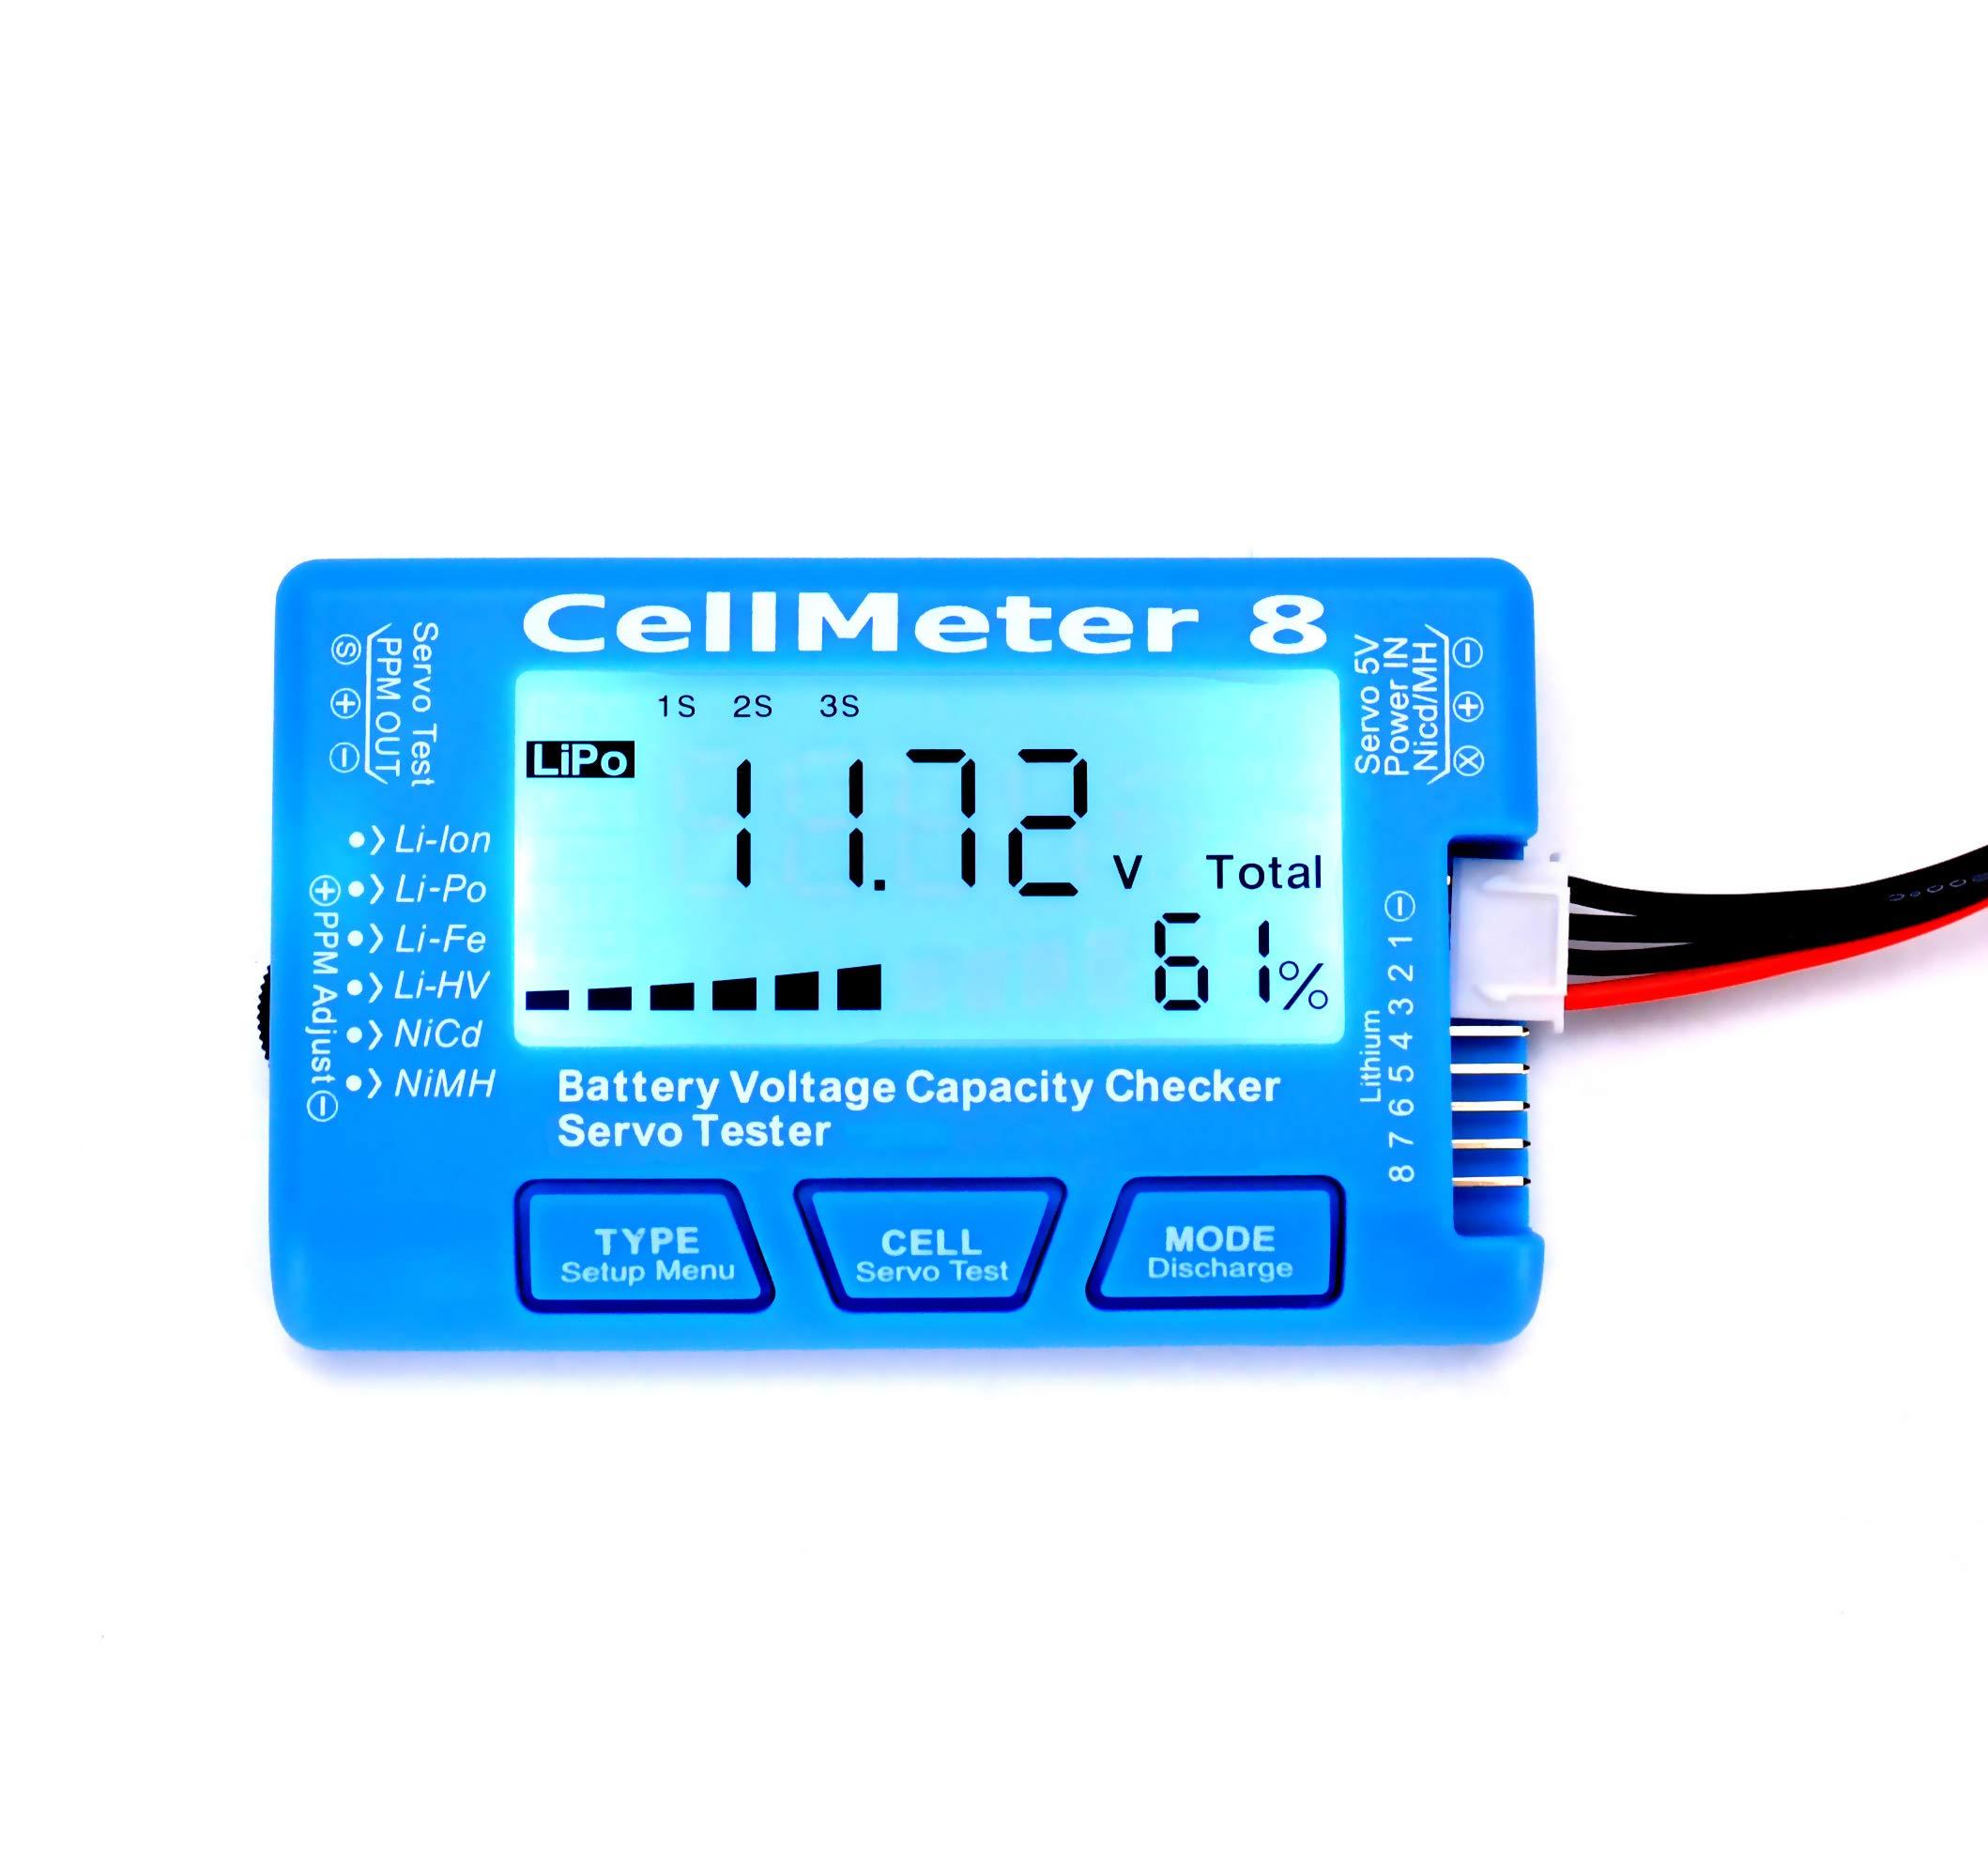 RC CellMeter 8 Digital Battery Capacity Checker Battery Voltage Tester LCD Backlight for LiPo Life Li-ion NiMH Nicd